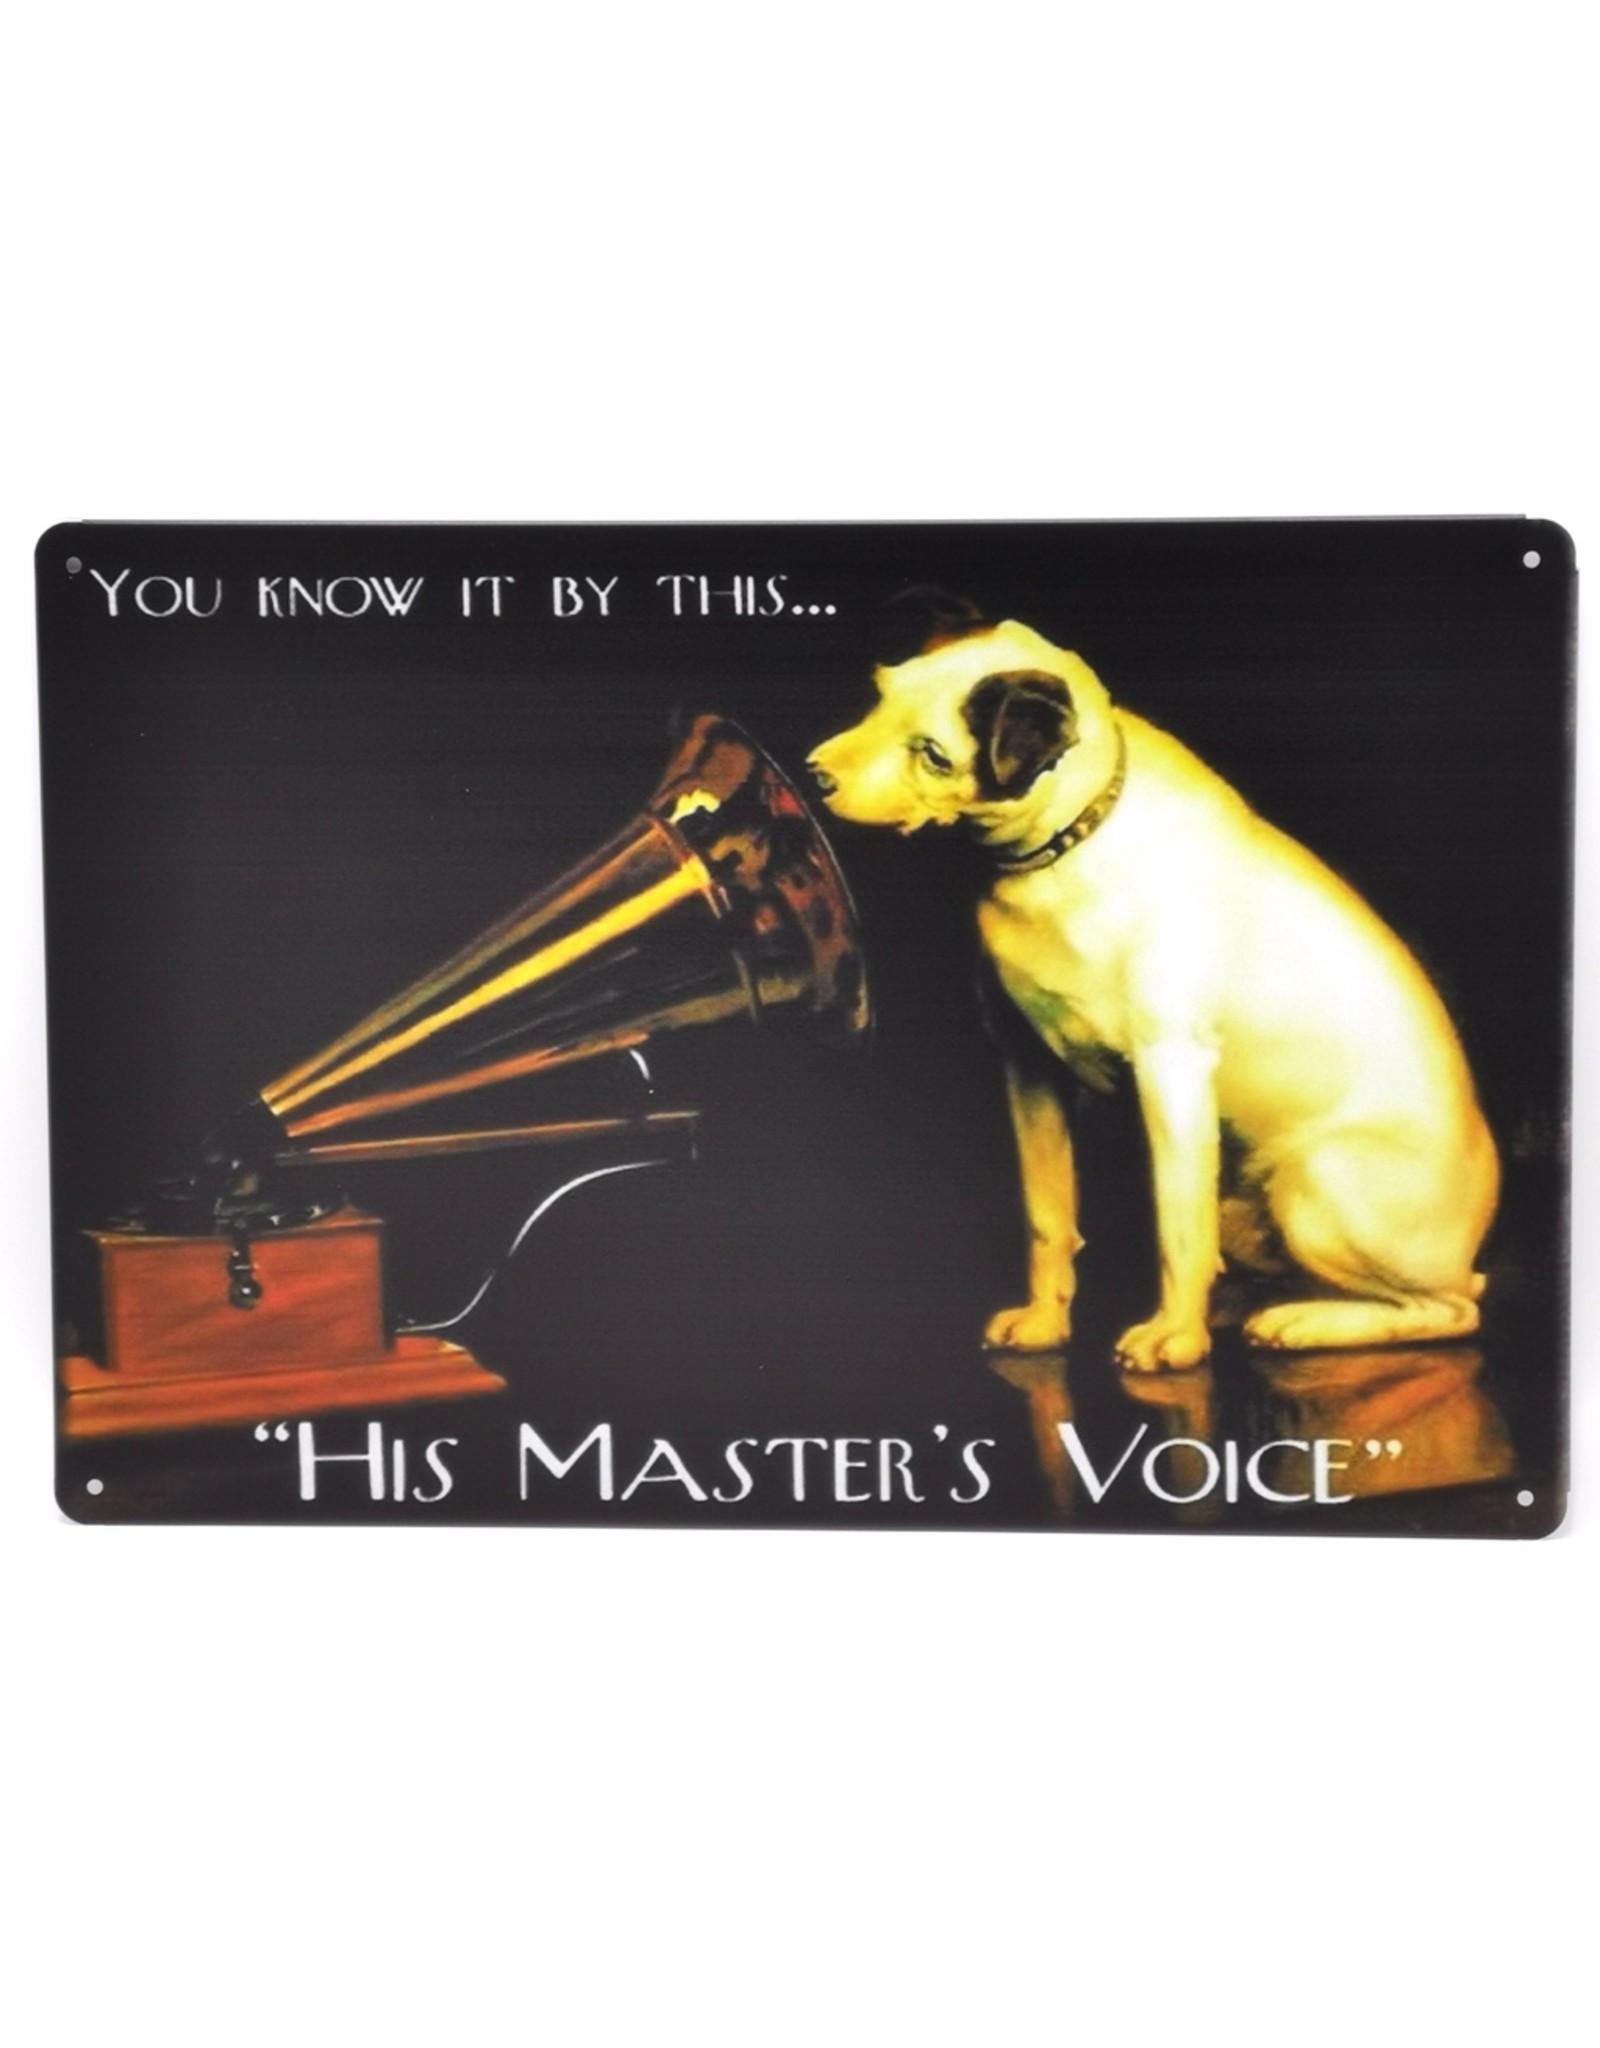 Jack Russel grammofoon metalen bord Miscellaneous - His Master's Voice Metalen bord Nipper